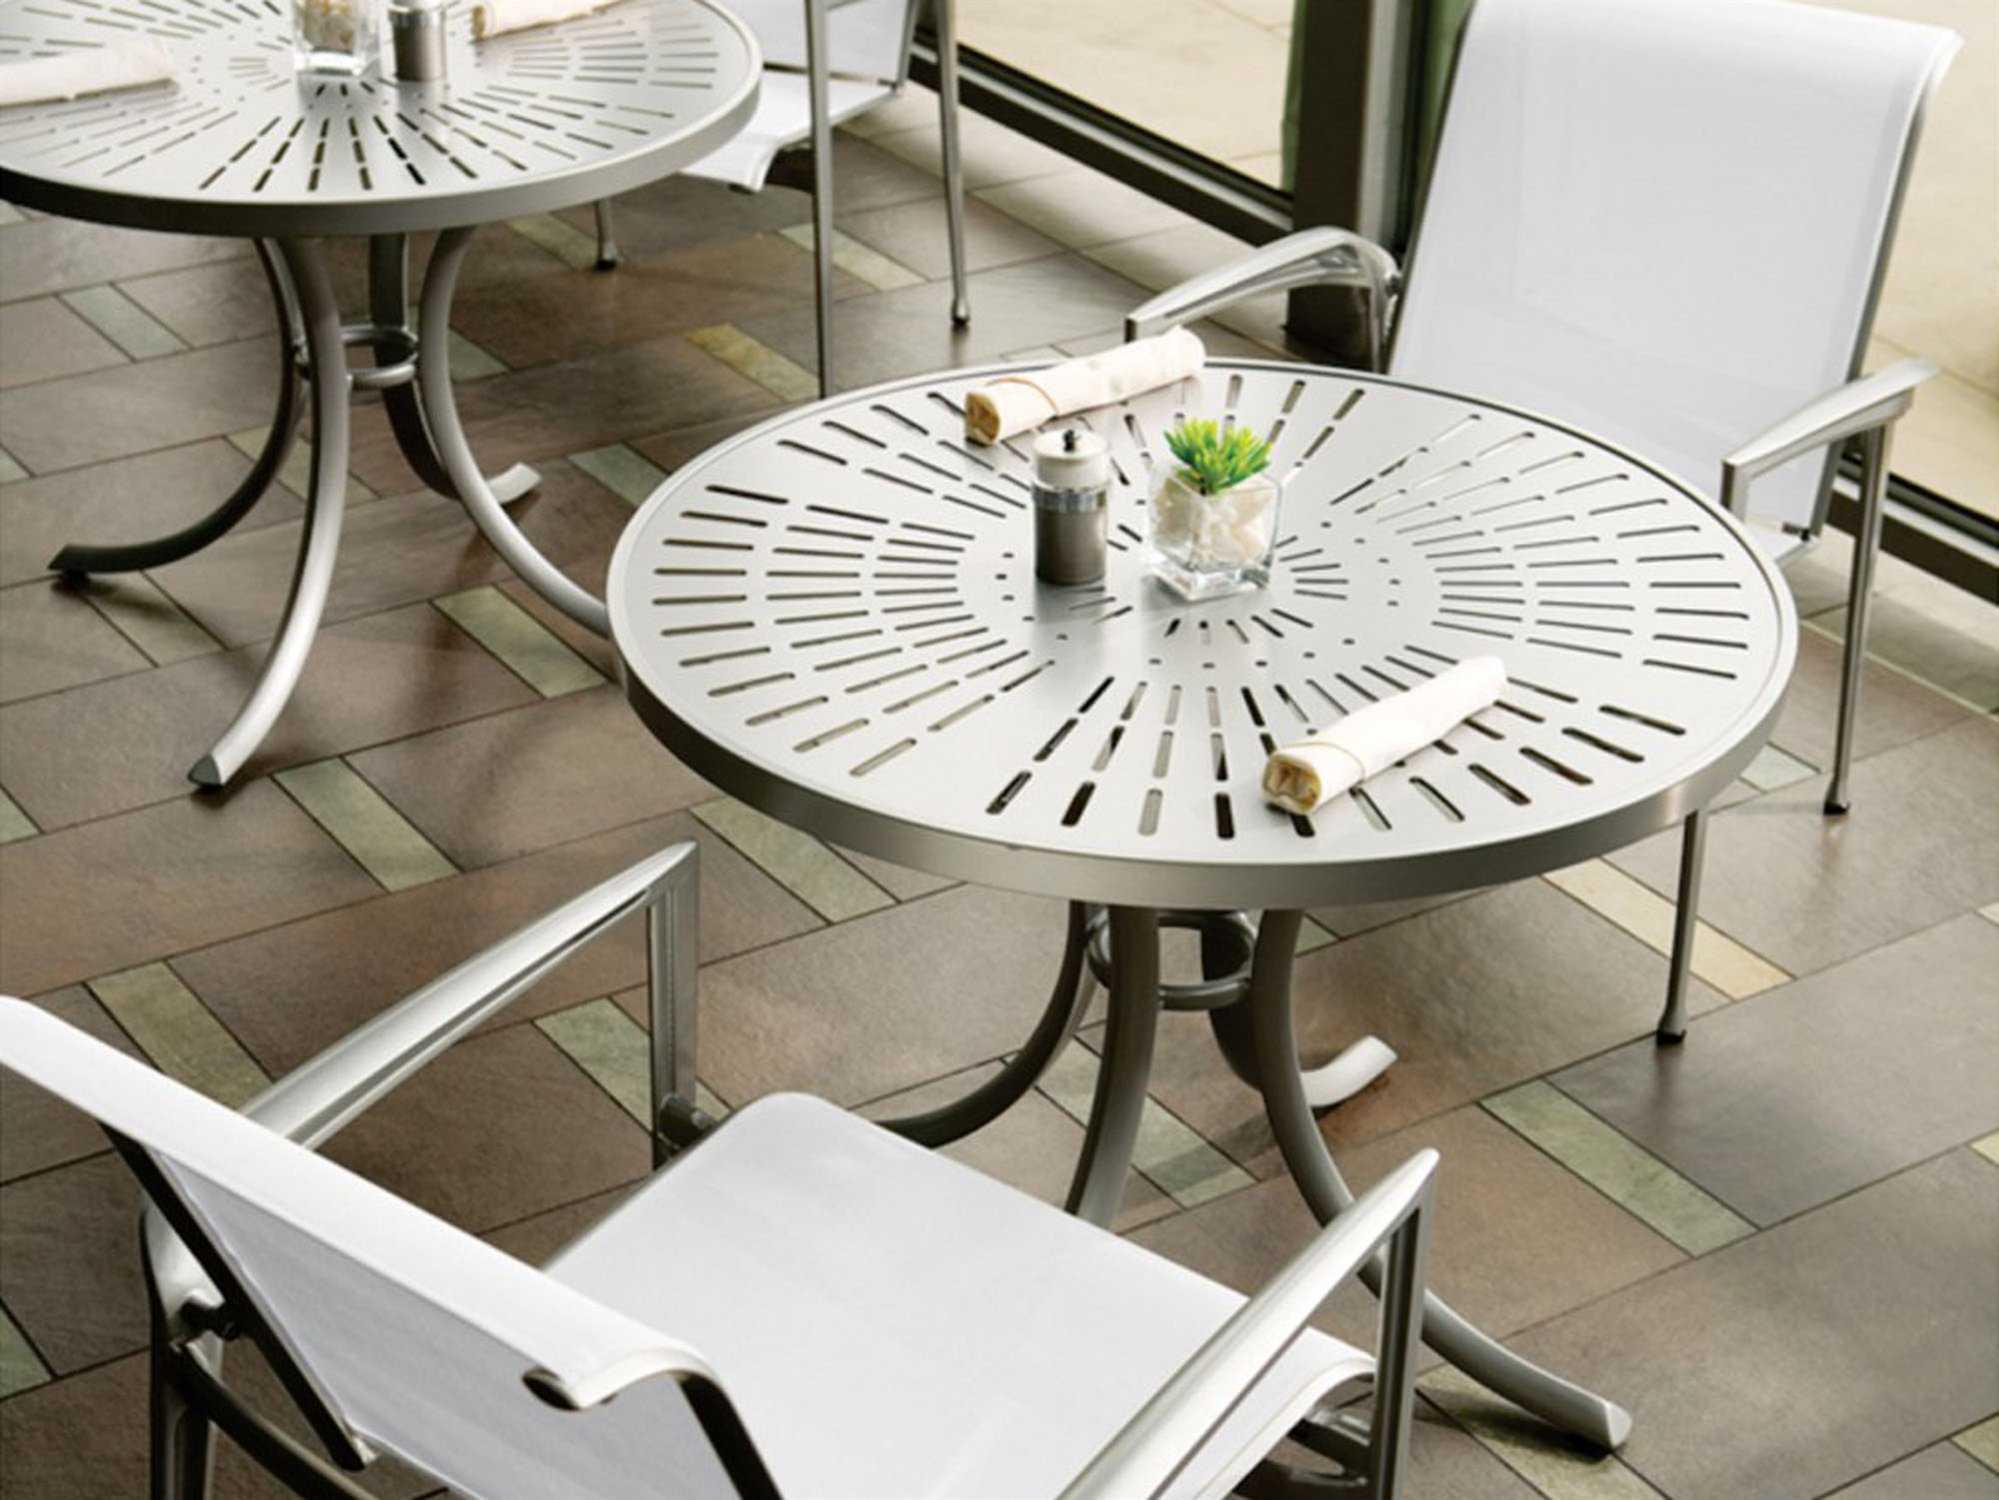 Tropitone la stratta aluminum 36 round dining table with - Aluminium picnic table with umbrella ...